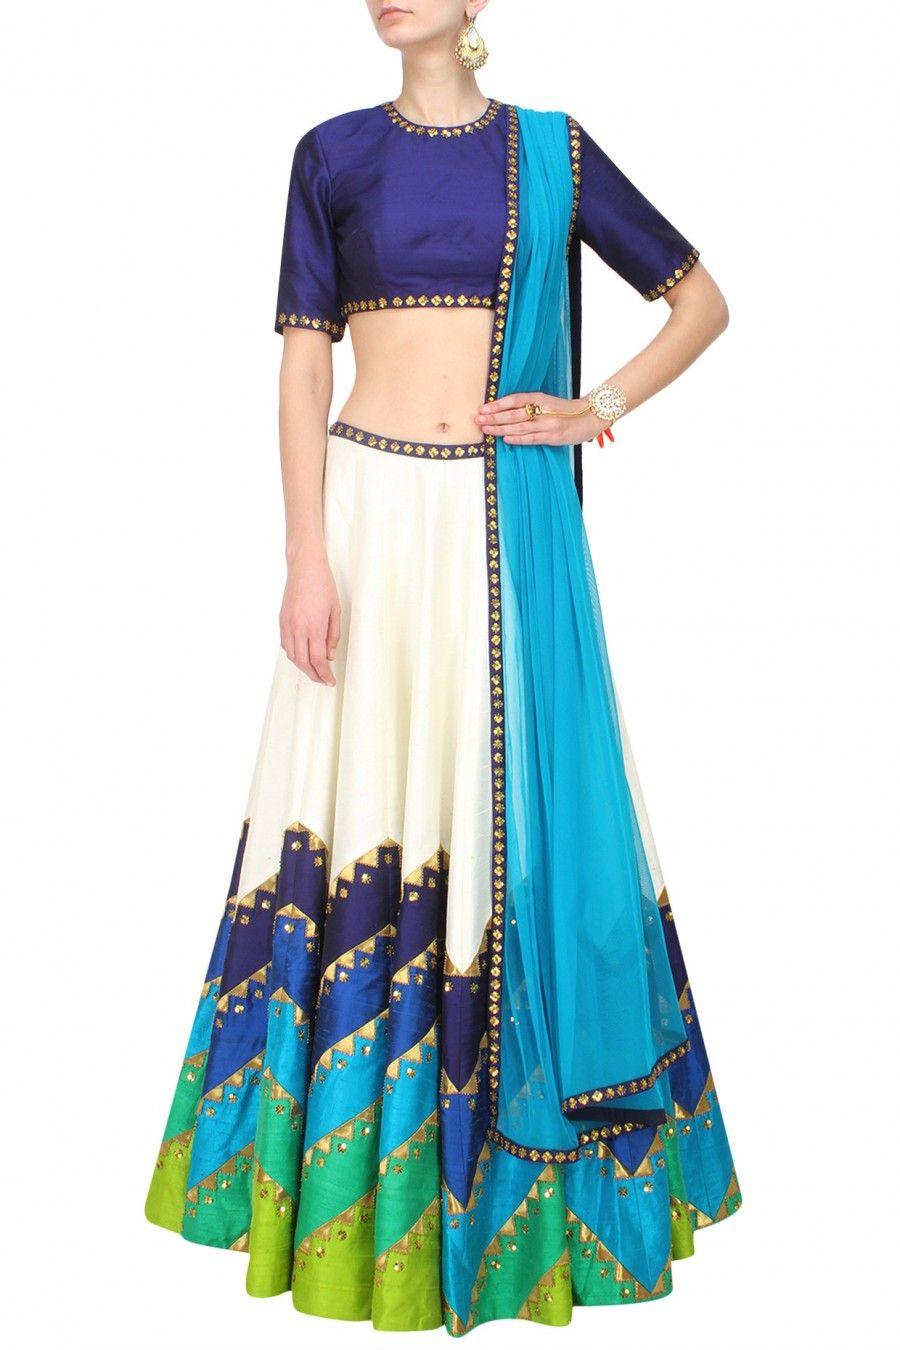 Priyal prakash lehanga pinterest receptions shades of blue